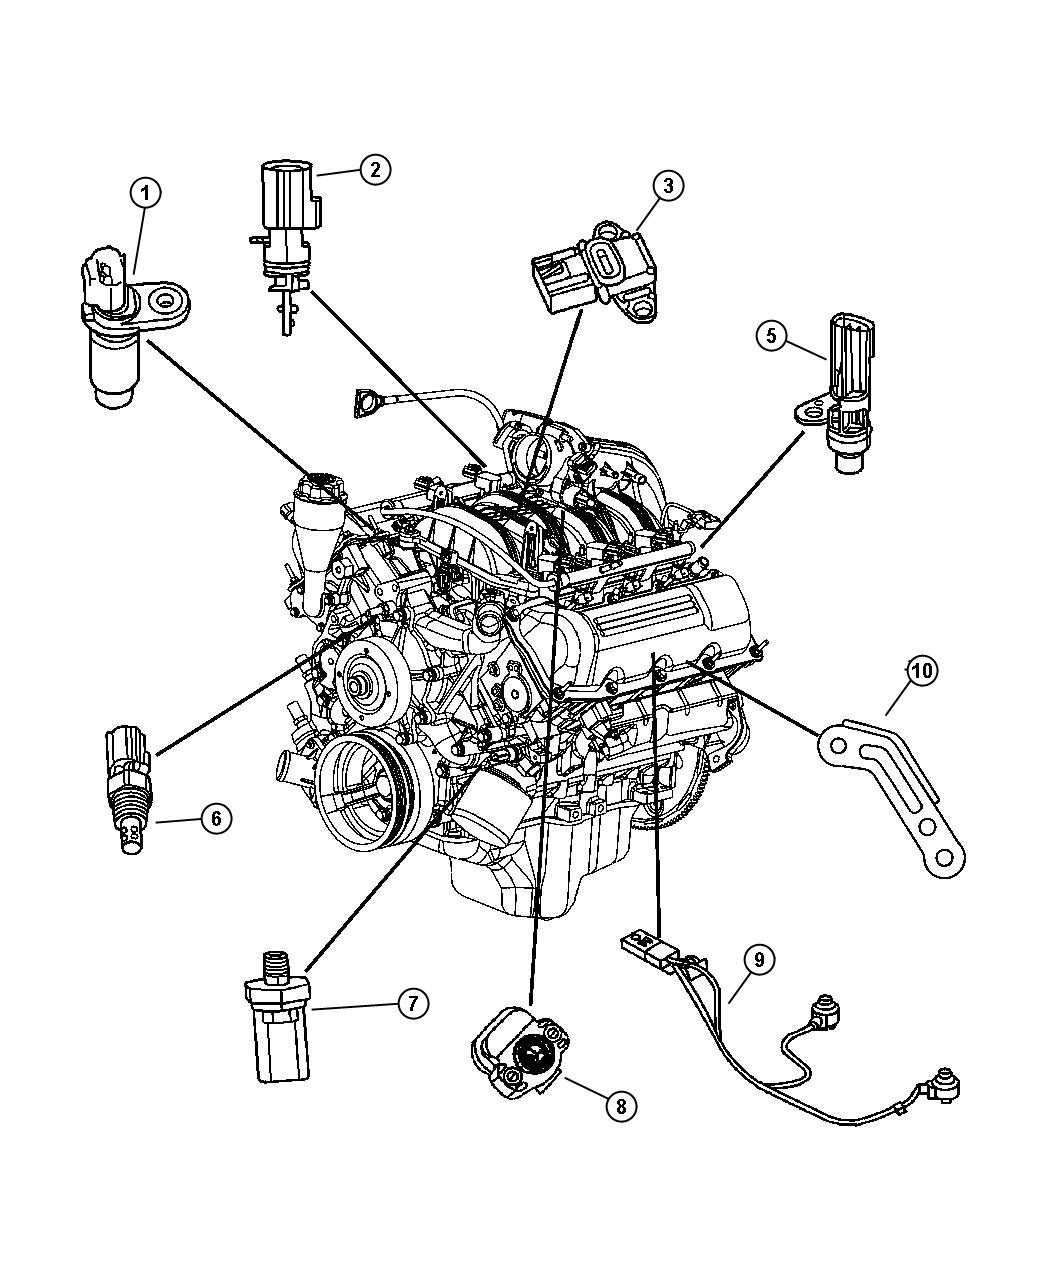 2004 Dodge Durango Sensor. Camshaft. Engine, Sensors, Case